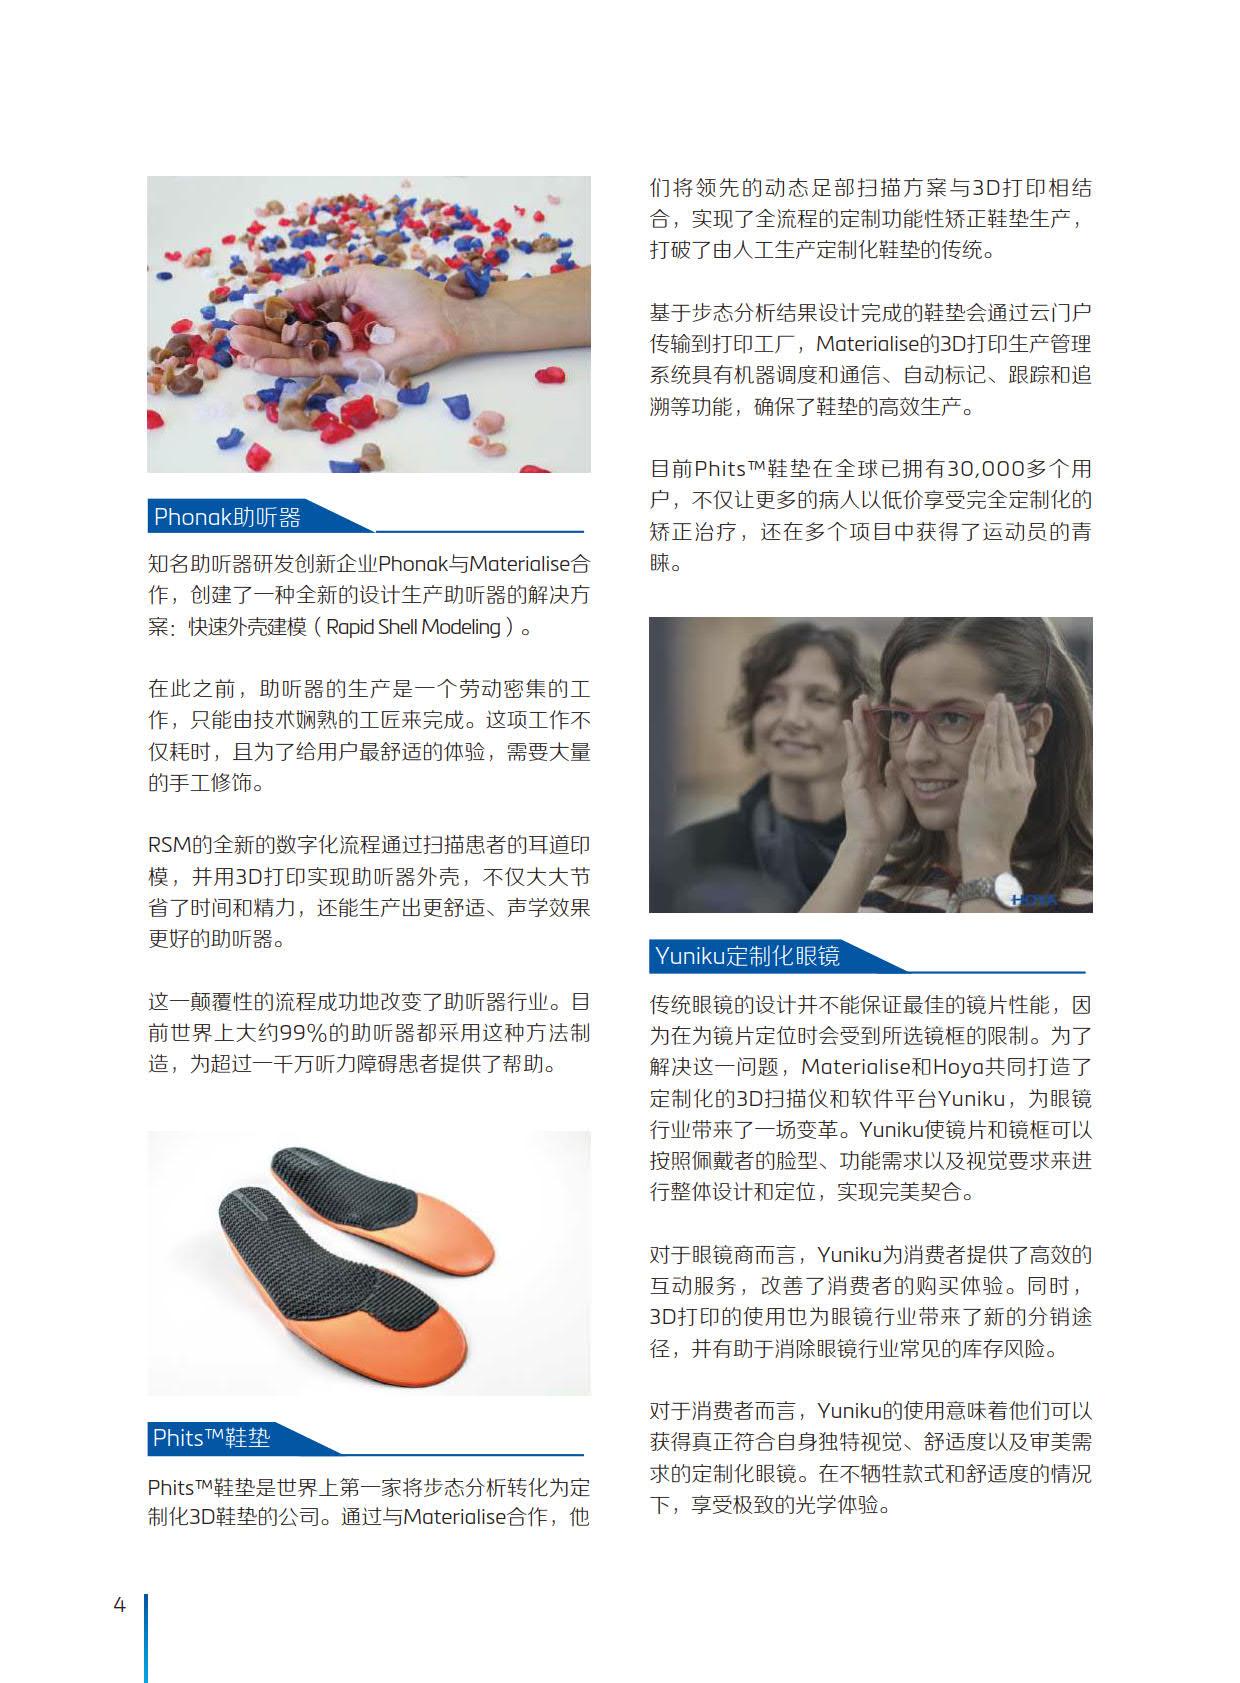 Materialise制造业调研报告_4.jpg